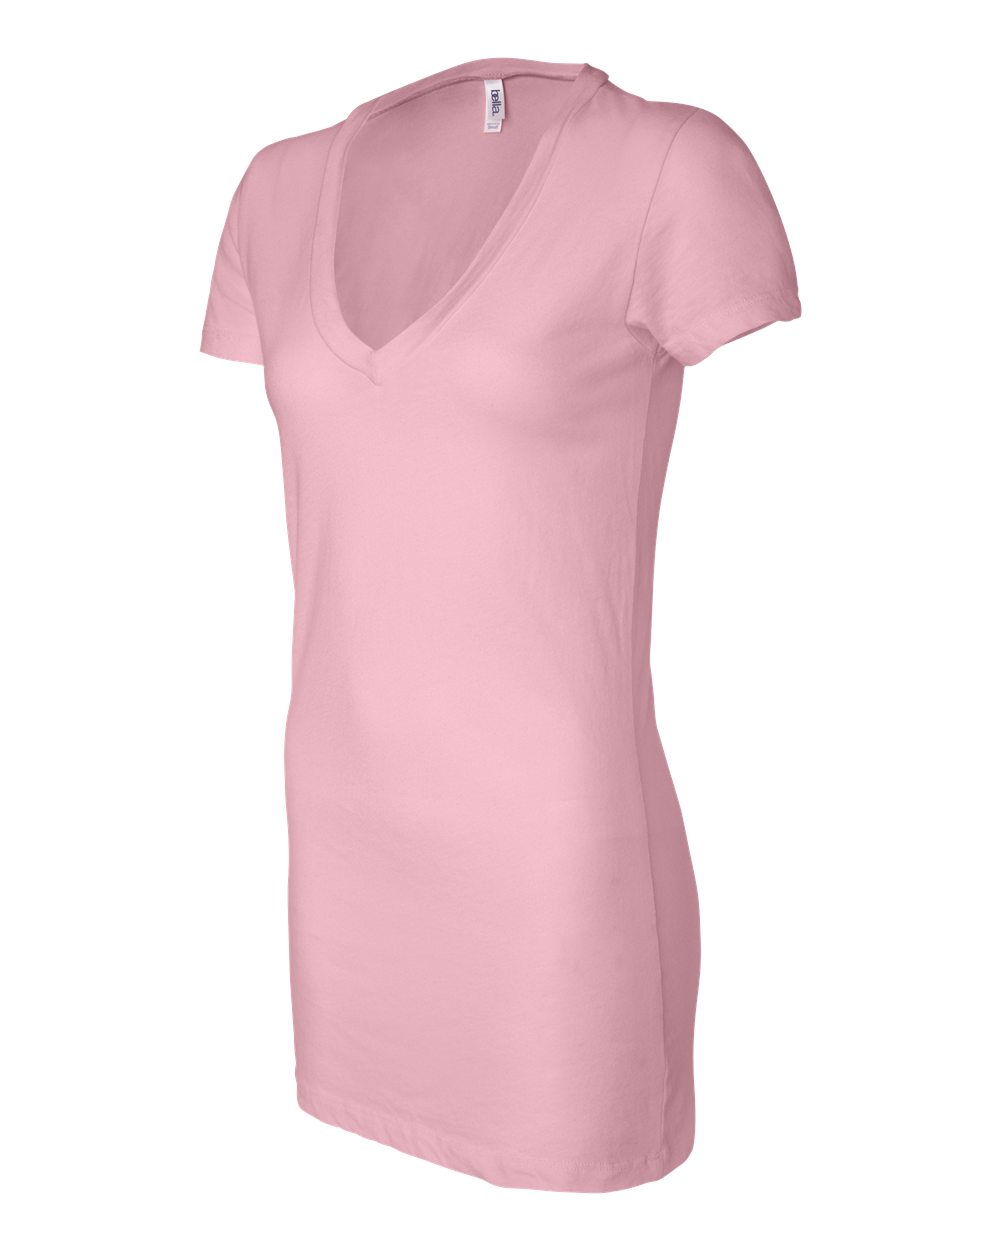 Bella 8417 Soft Pink